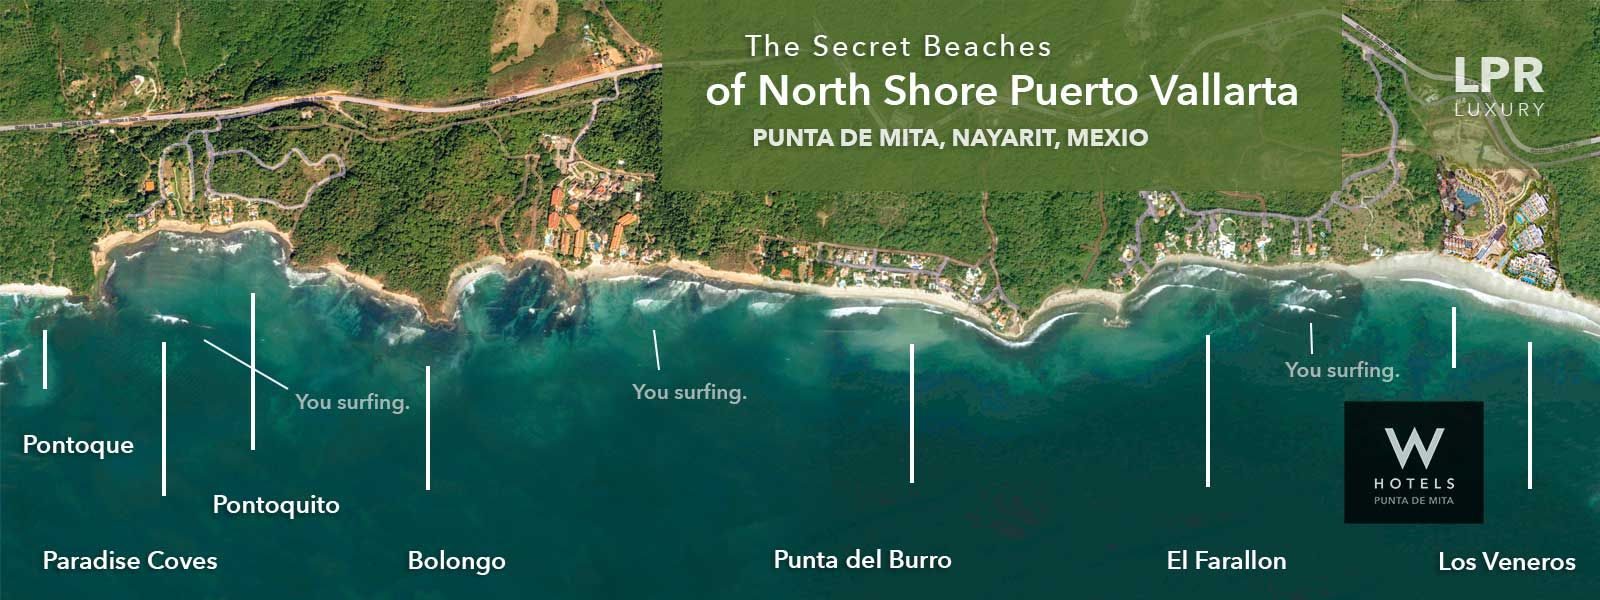 Image Result For Los Veneros Punta Mita Surf Nayarit Paradise Cove Secret Beach